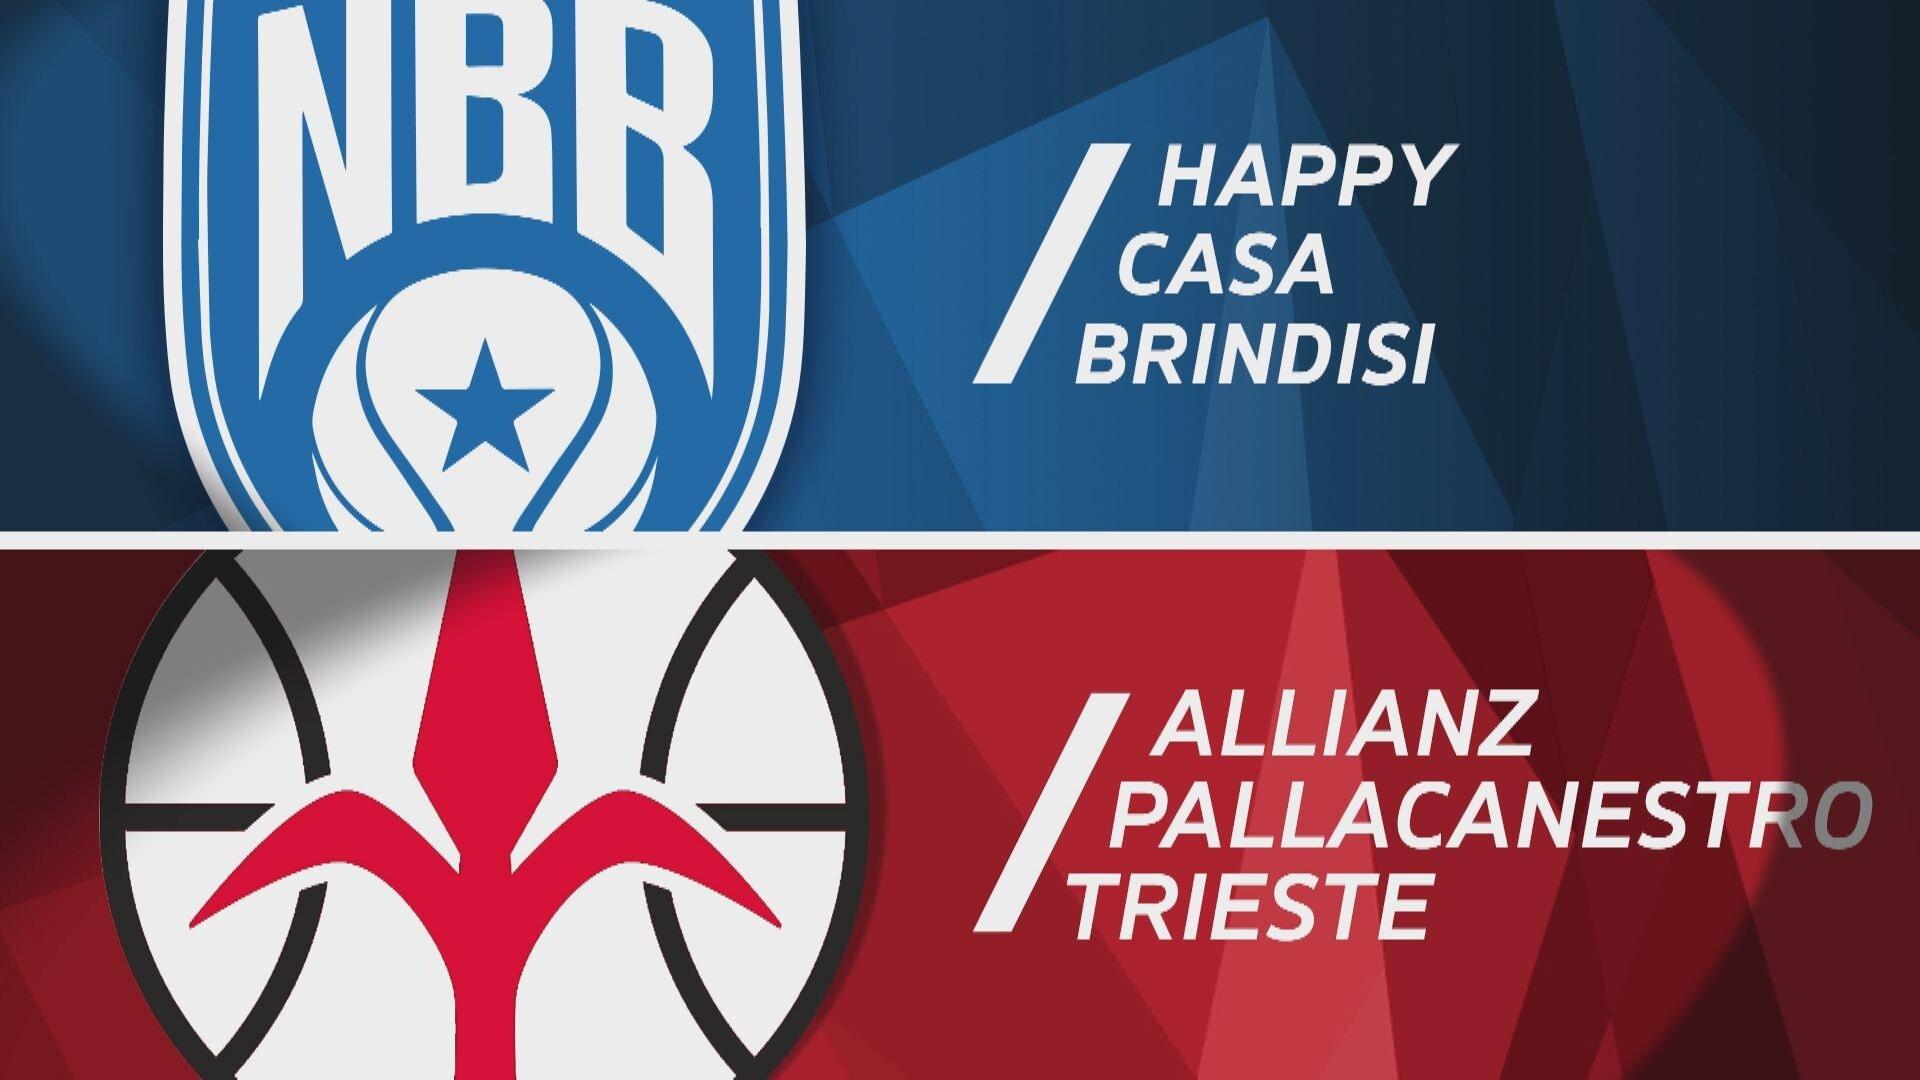 Happy Casa Brindisi - Allianz Pallacanestro Trieste 81-74